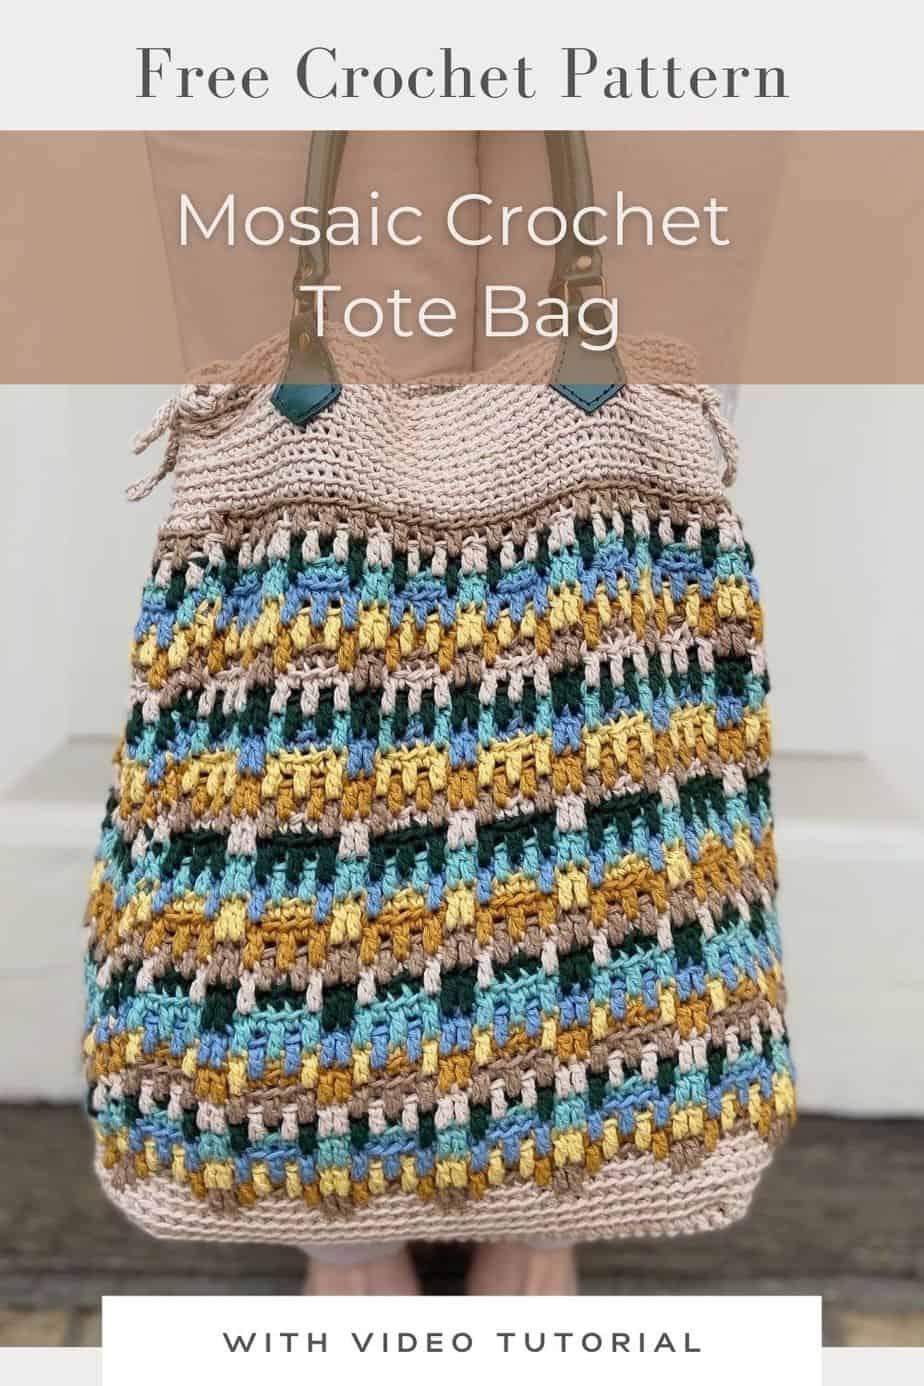 mosaic crochet tote bag with green handles